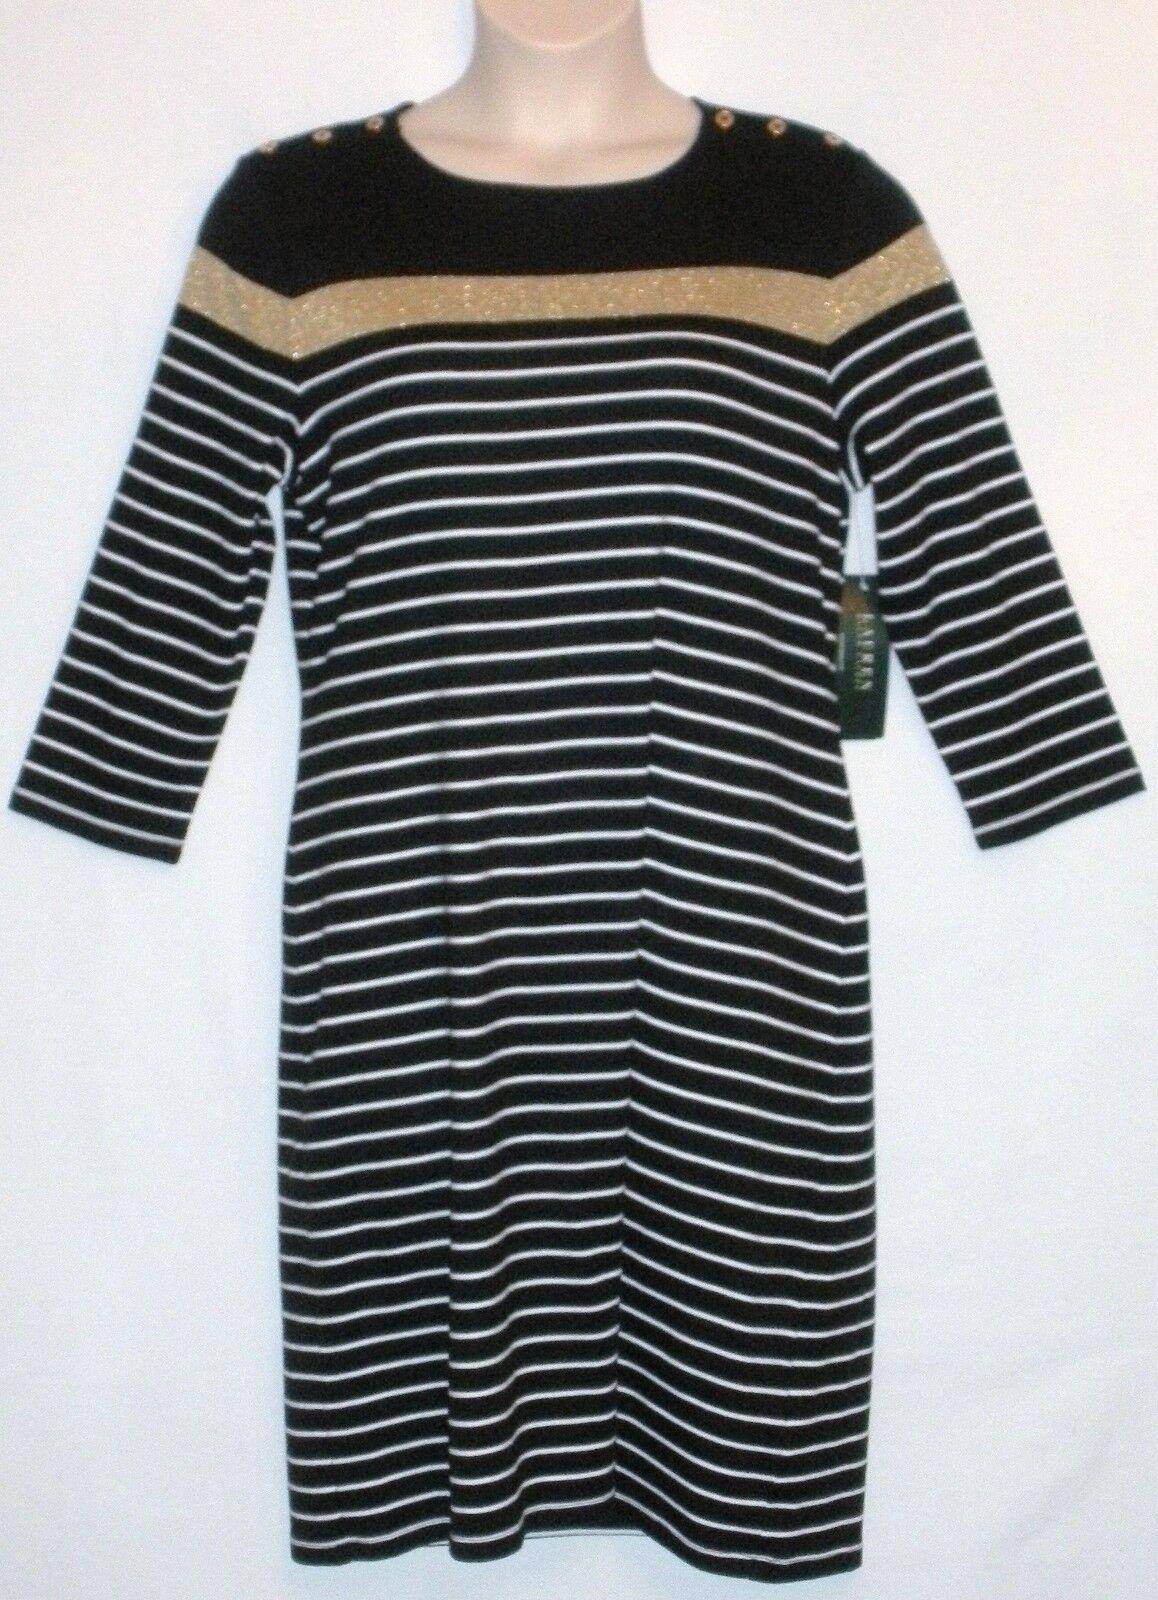 NEW with TAG  LAUREN RALPH LAUREN 3 4 Sleeve Dress Größe XL - MSRP